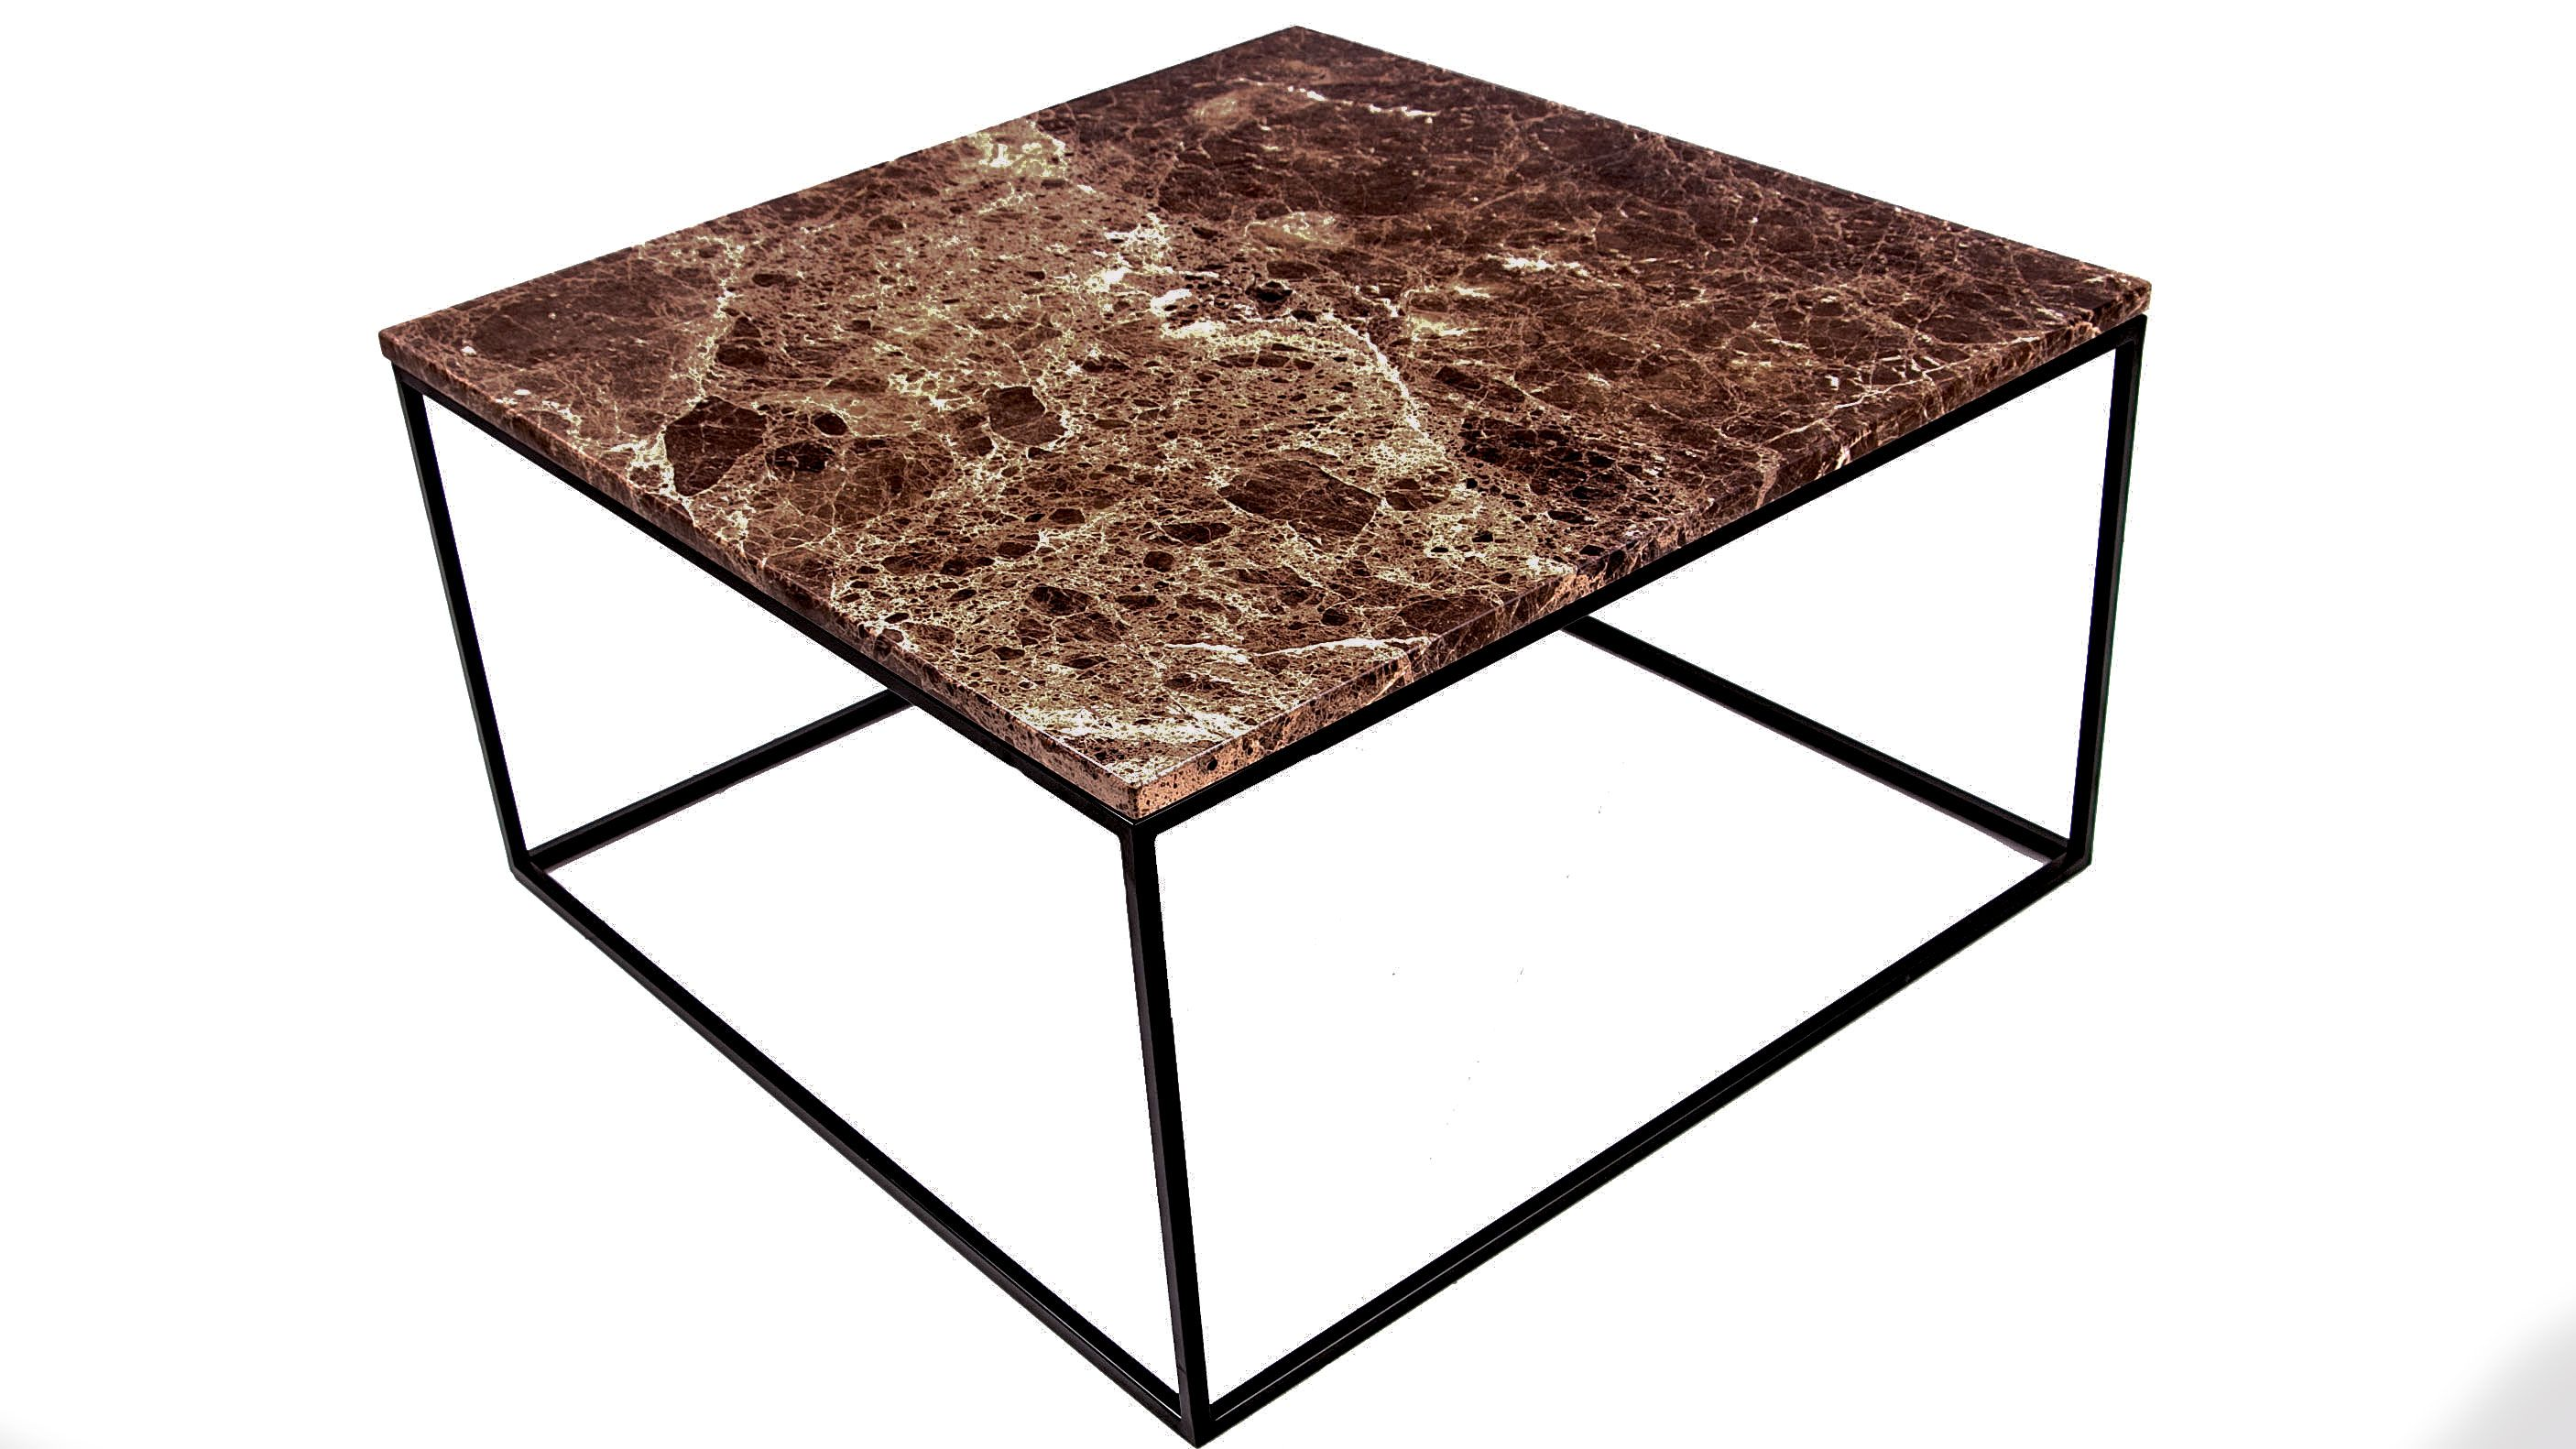 Brunt marmorbord Soffbord, marmor, stålram, vardagsrum http  sweef se bord 174 jaguaren